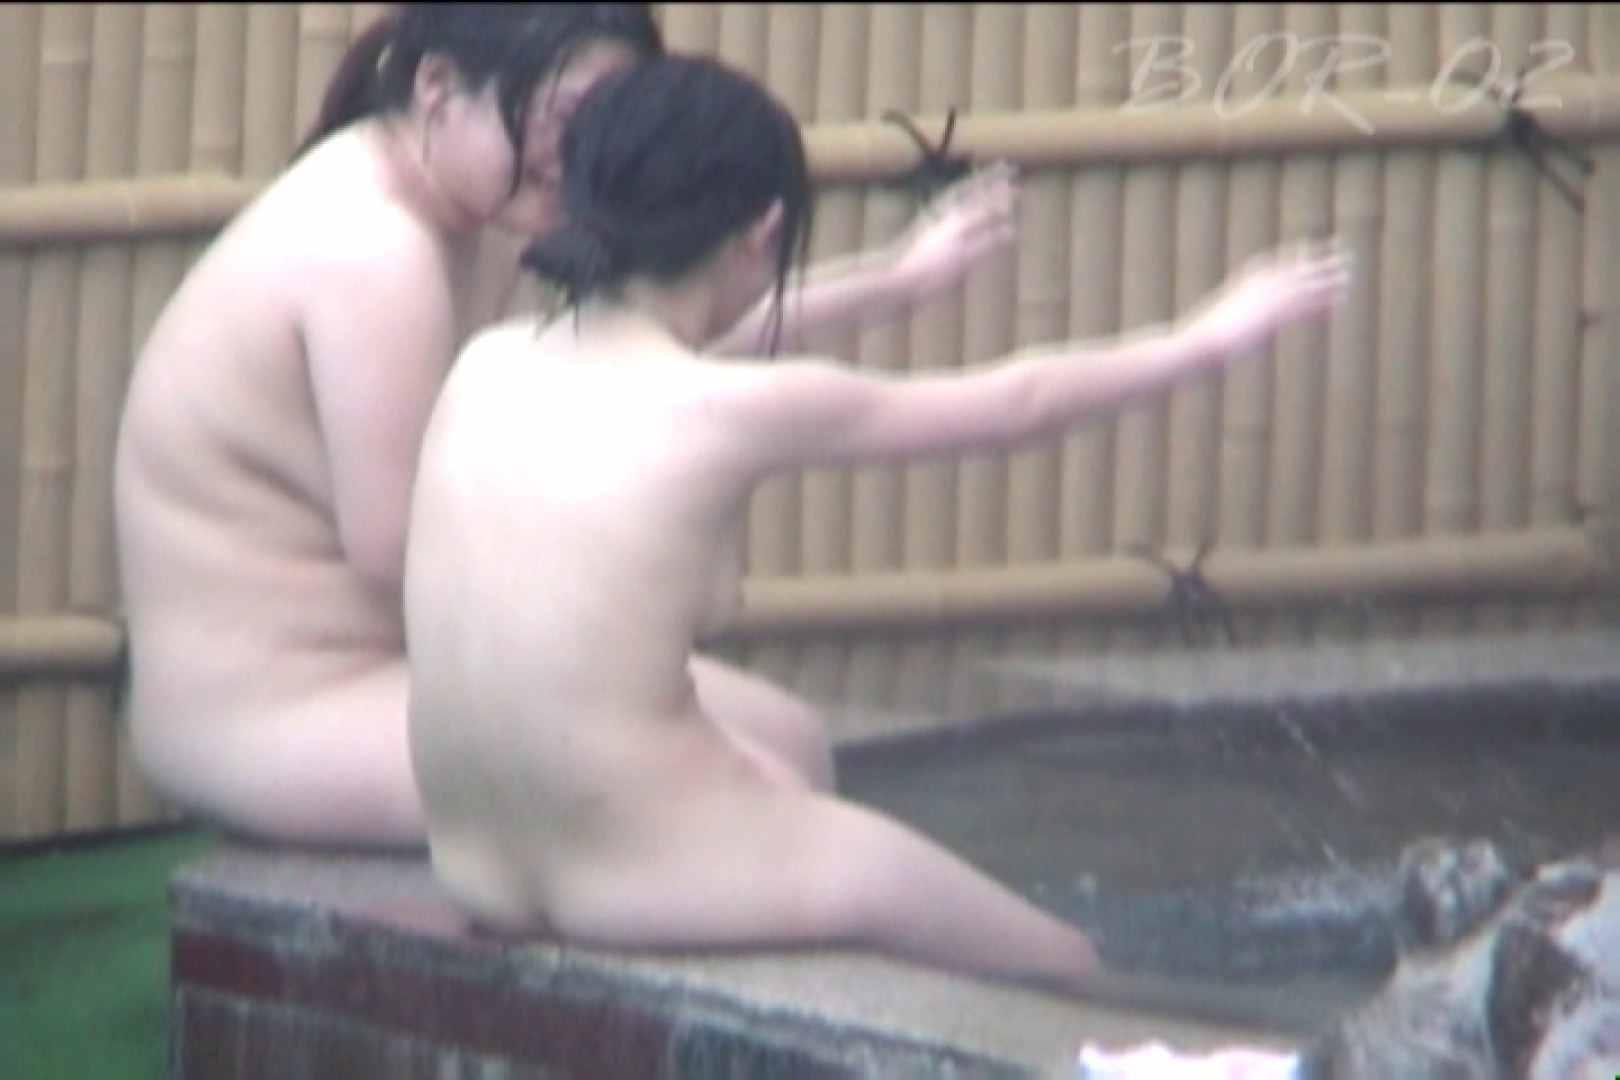 Aquaな露天風呂Vol.471 露天風呂突入 | 盗撮師作品  70pic 61